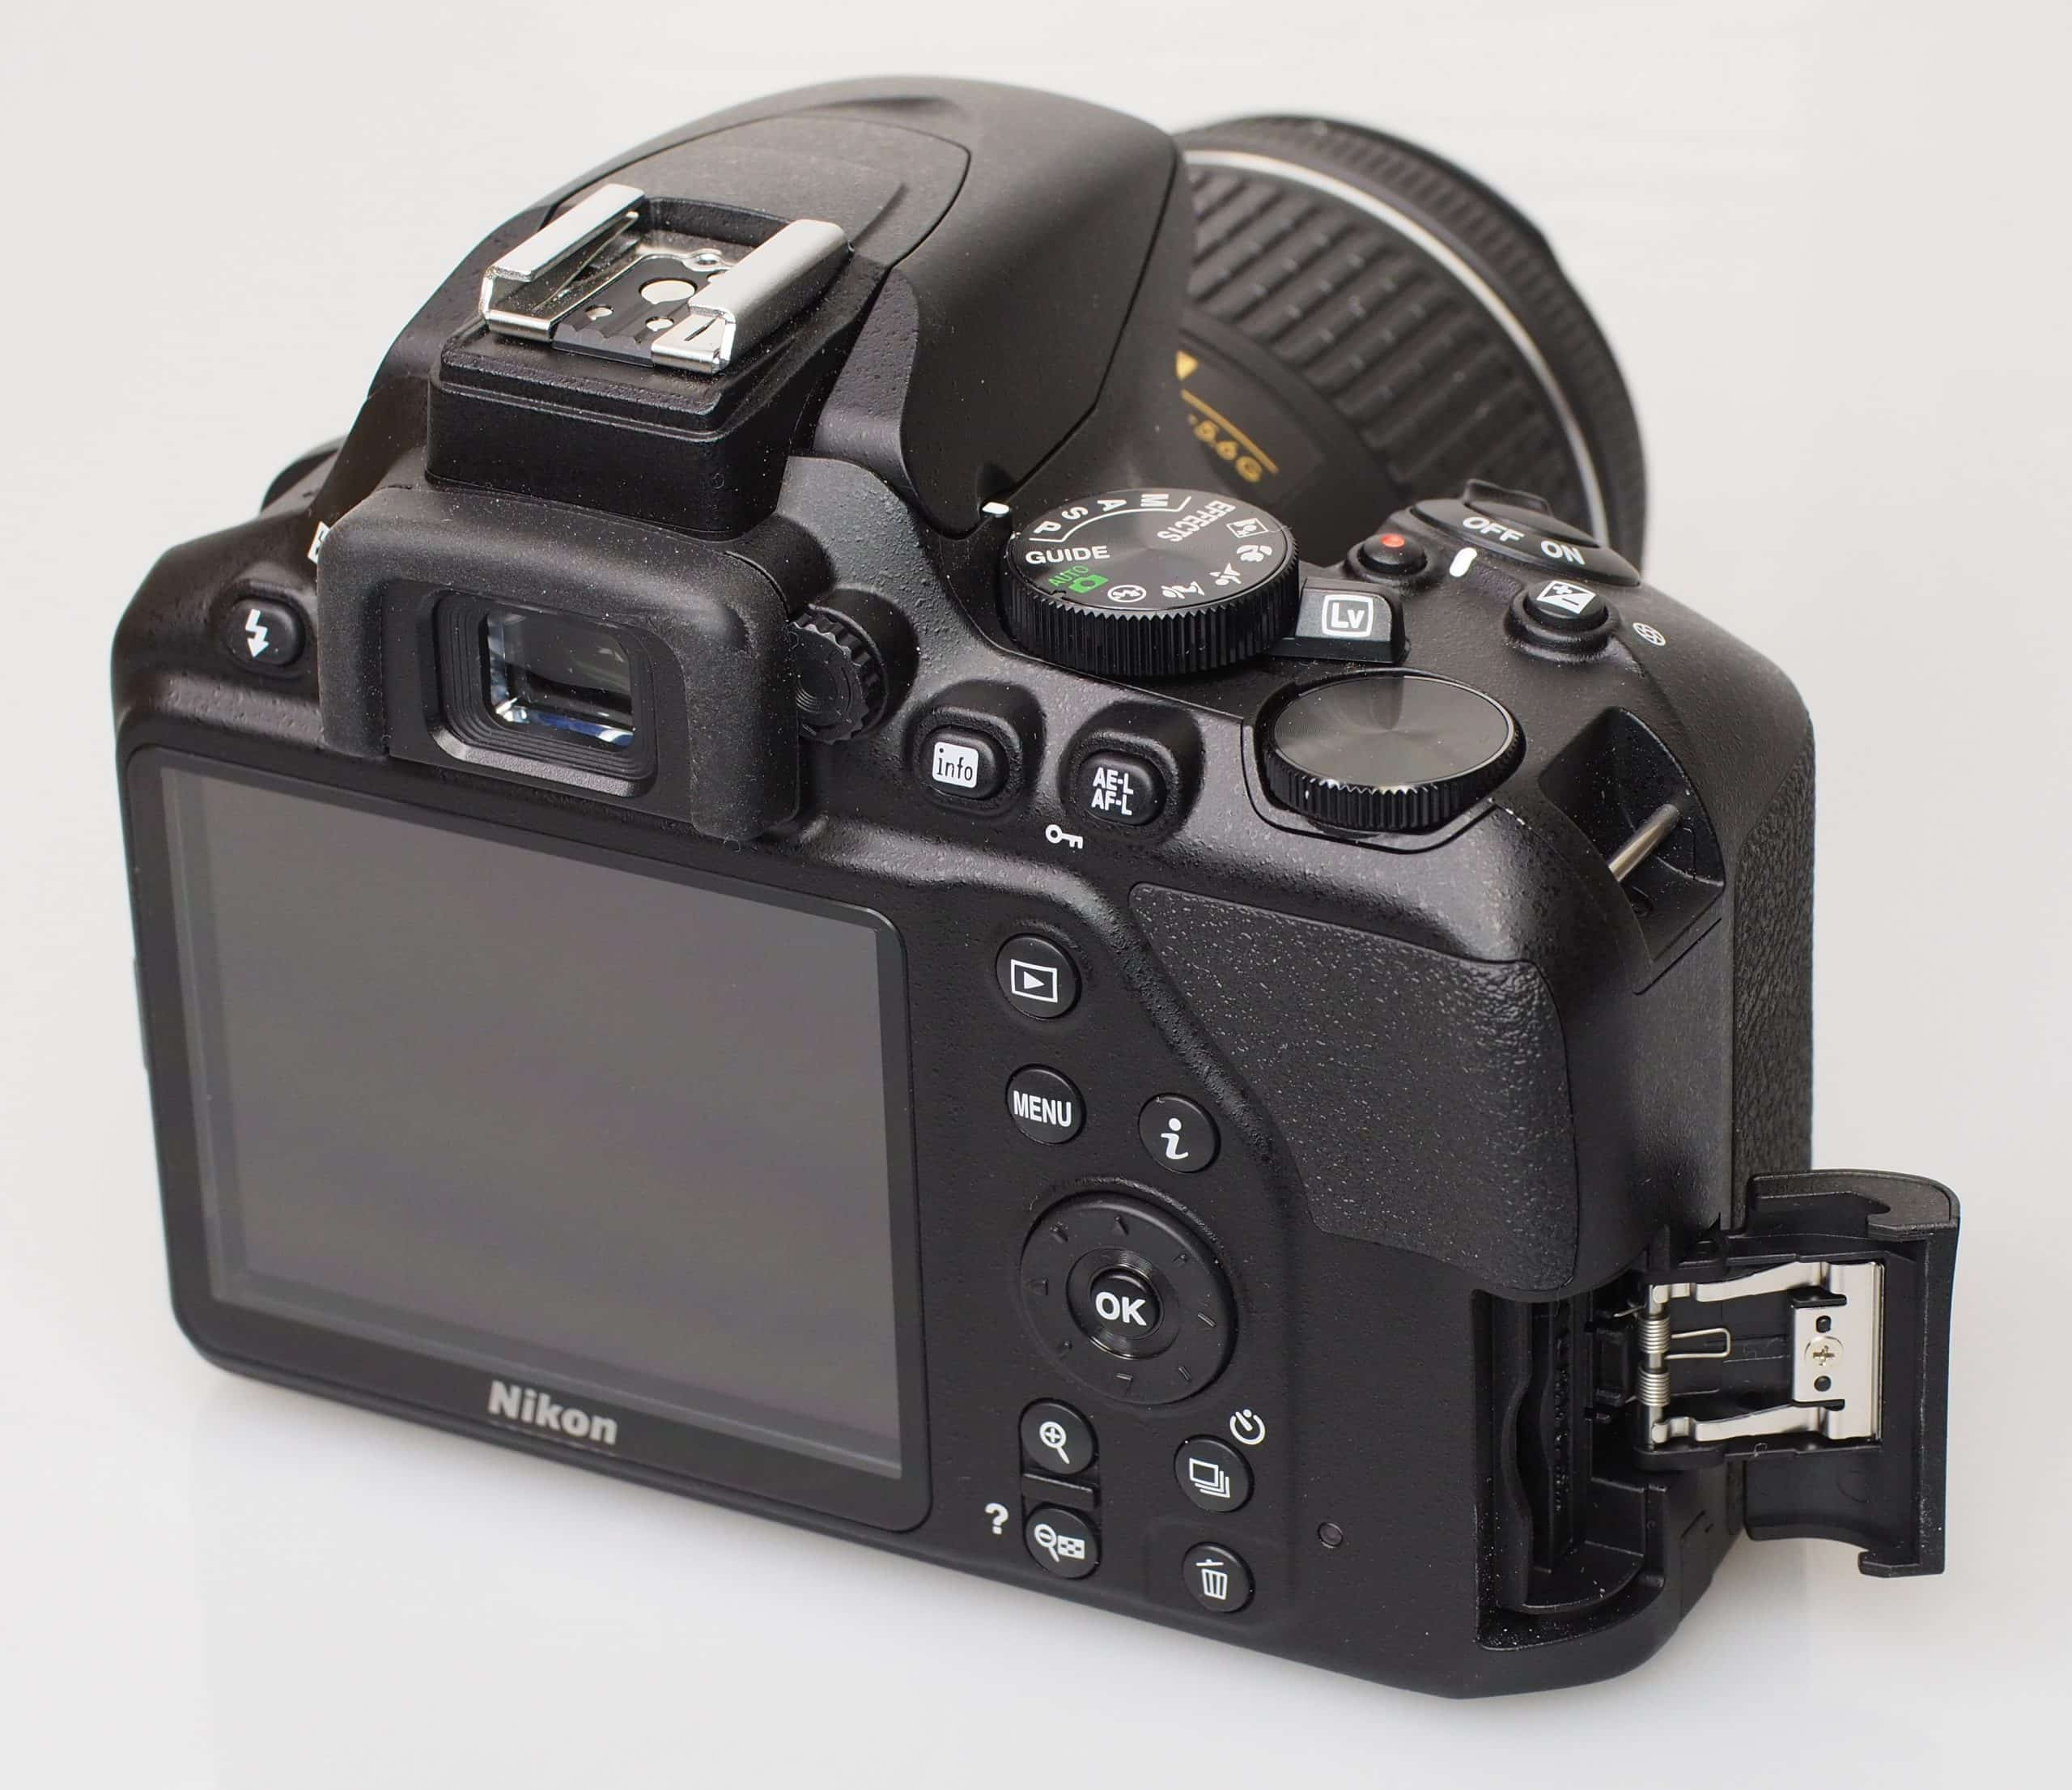 goedkope spiegelreflexcamera nikon d3500 review